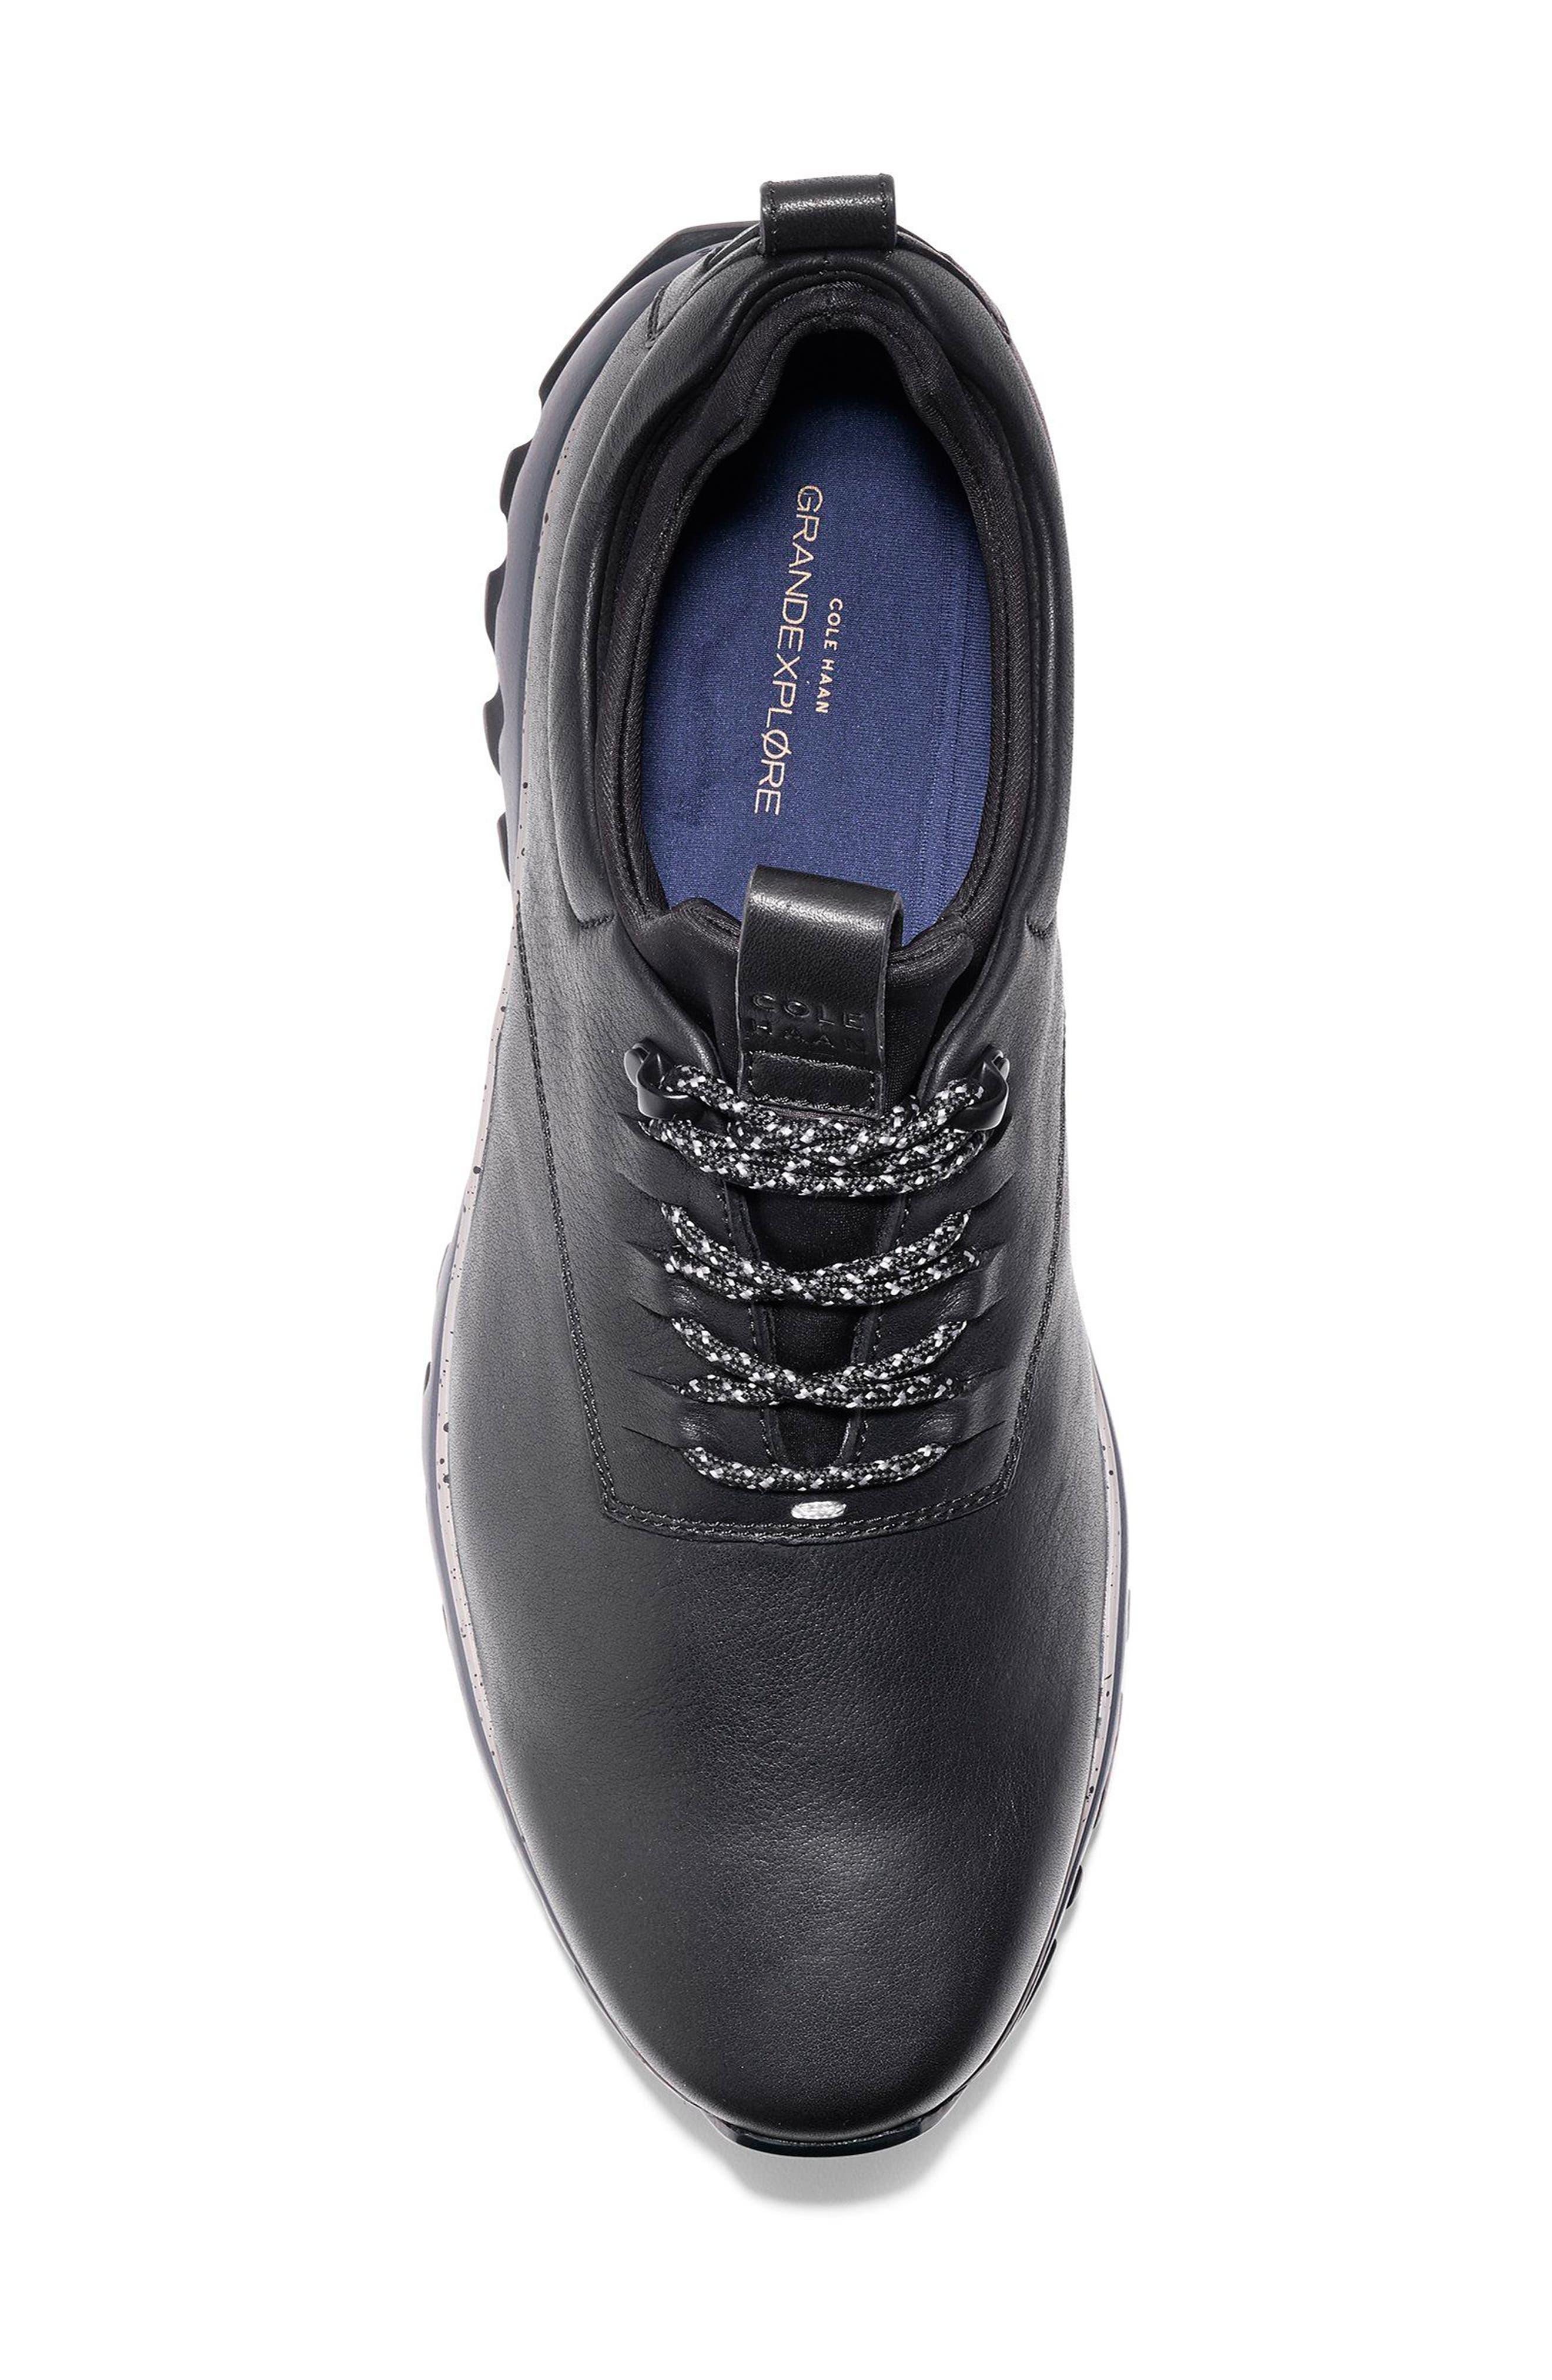 GrandExpløre All Terrain Waterproof Sneaker,                             Alternate thumbnail 5, color,                             BLACK/ IRONSTONE LEATHER